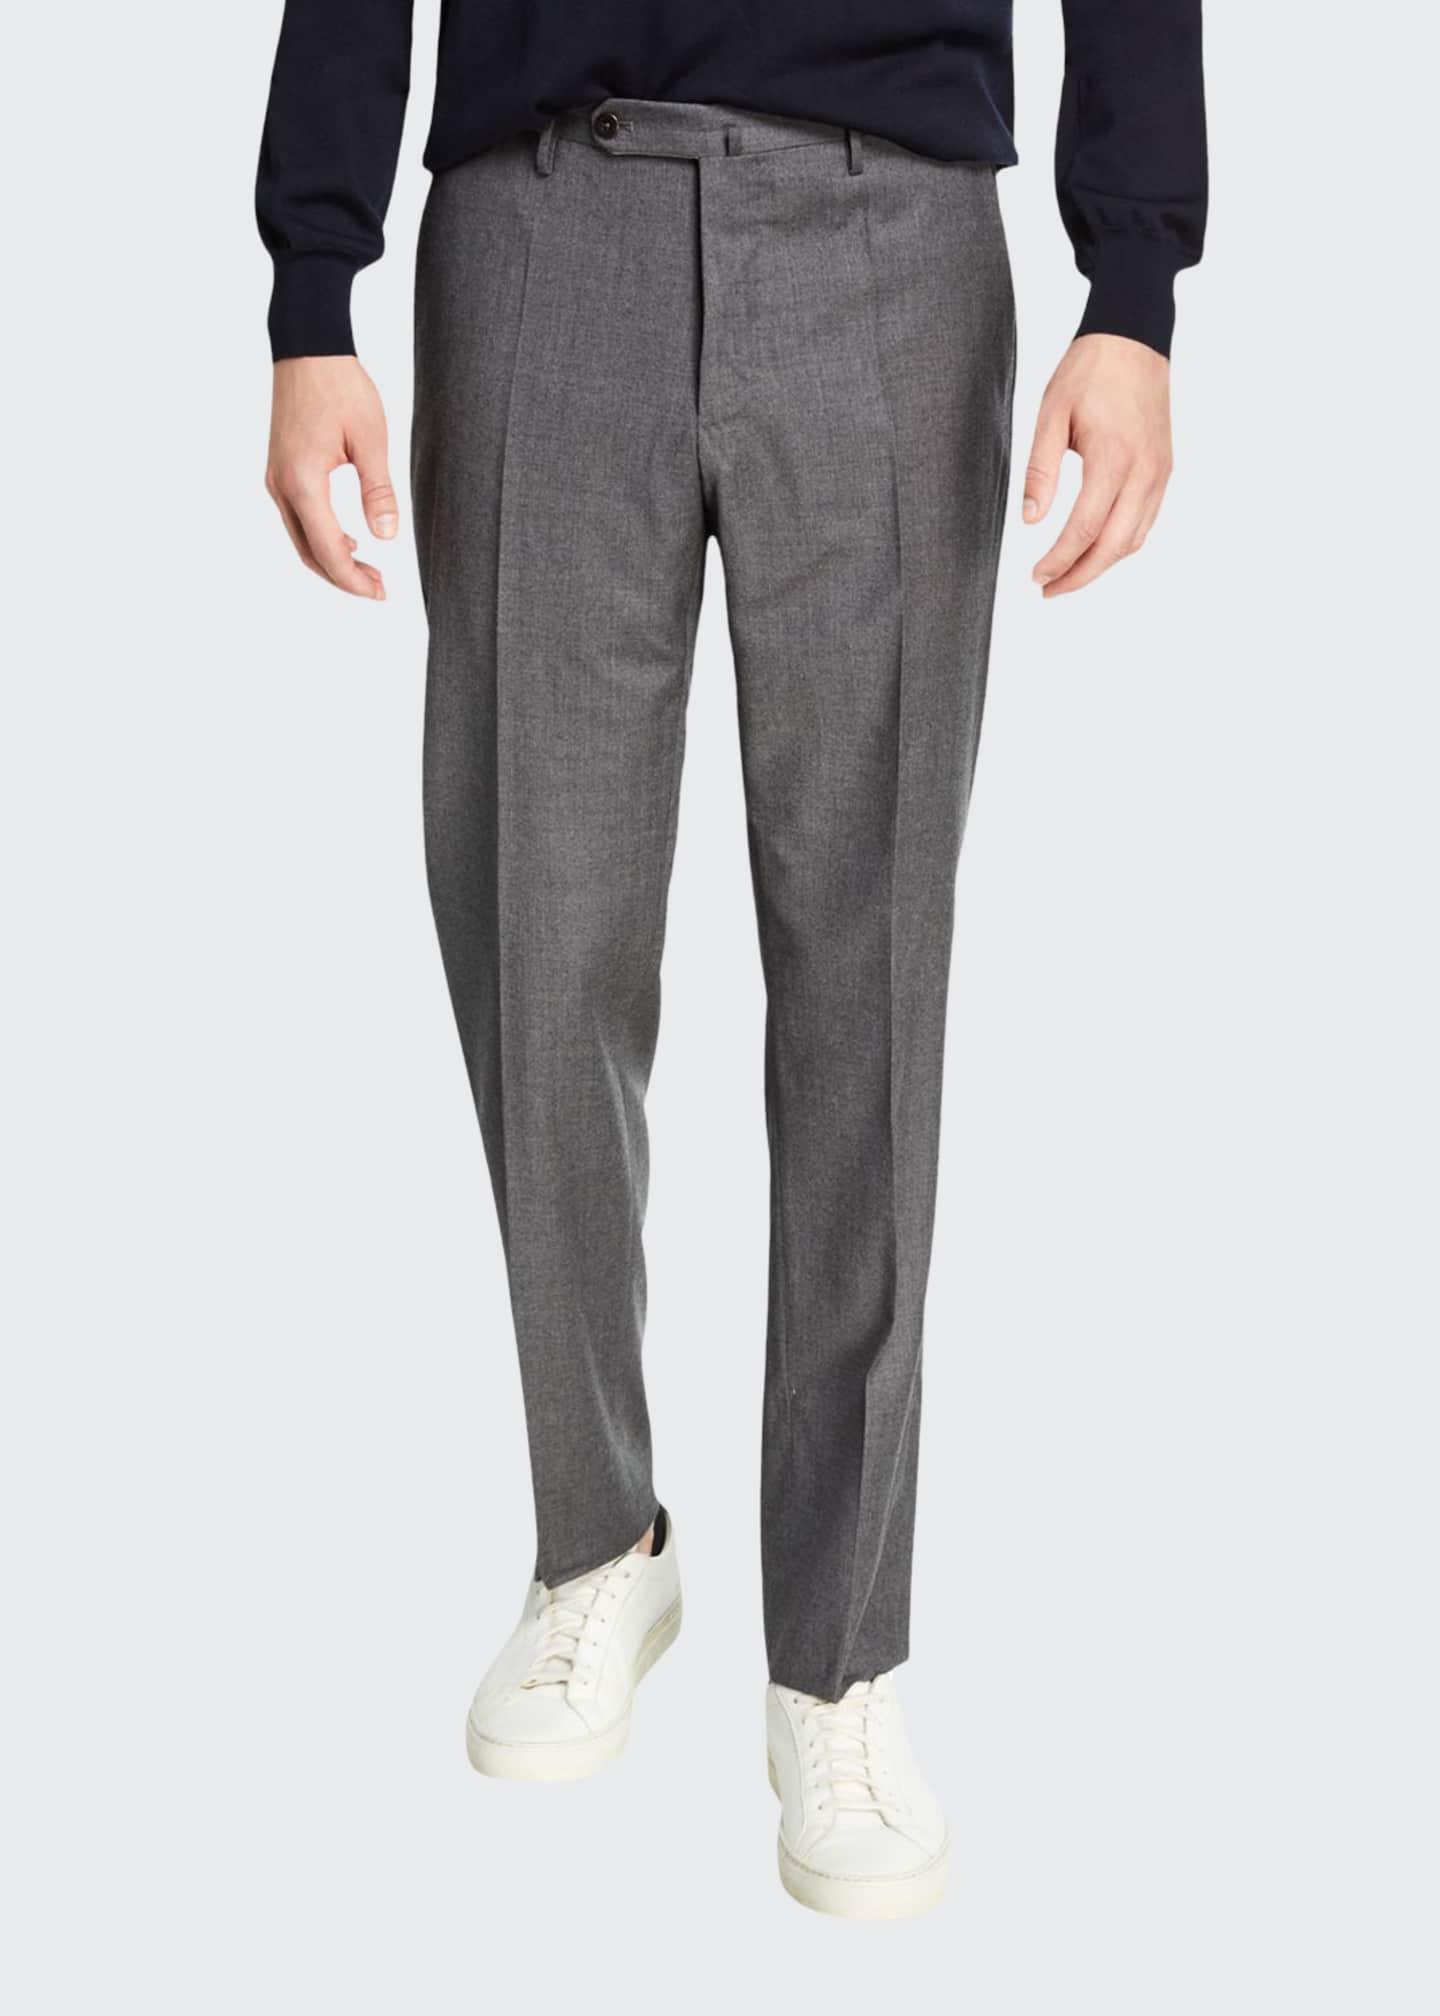 Incotex Men's Tropical Wool Standard-Fit Pants